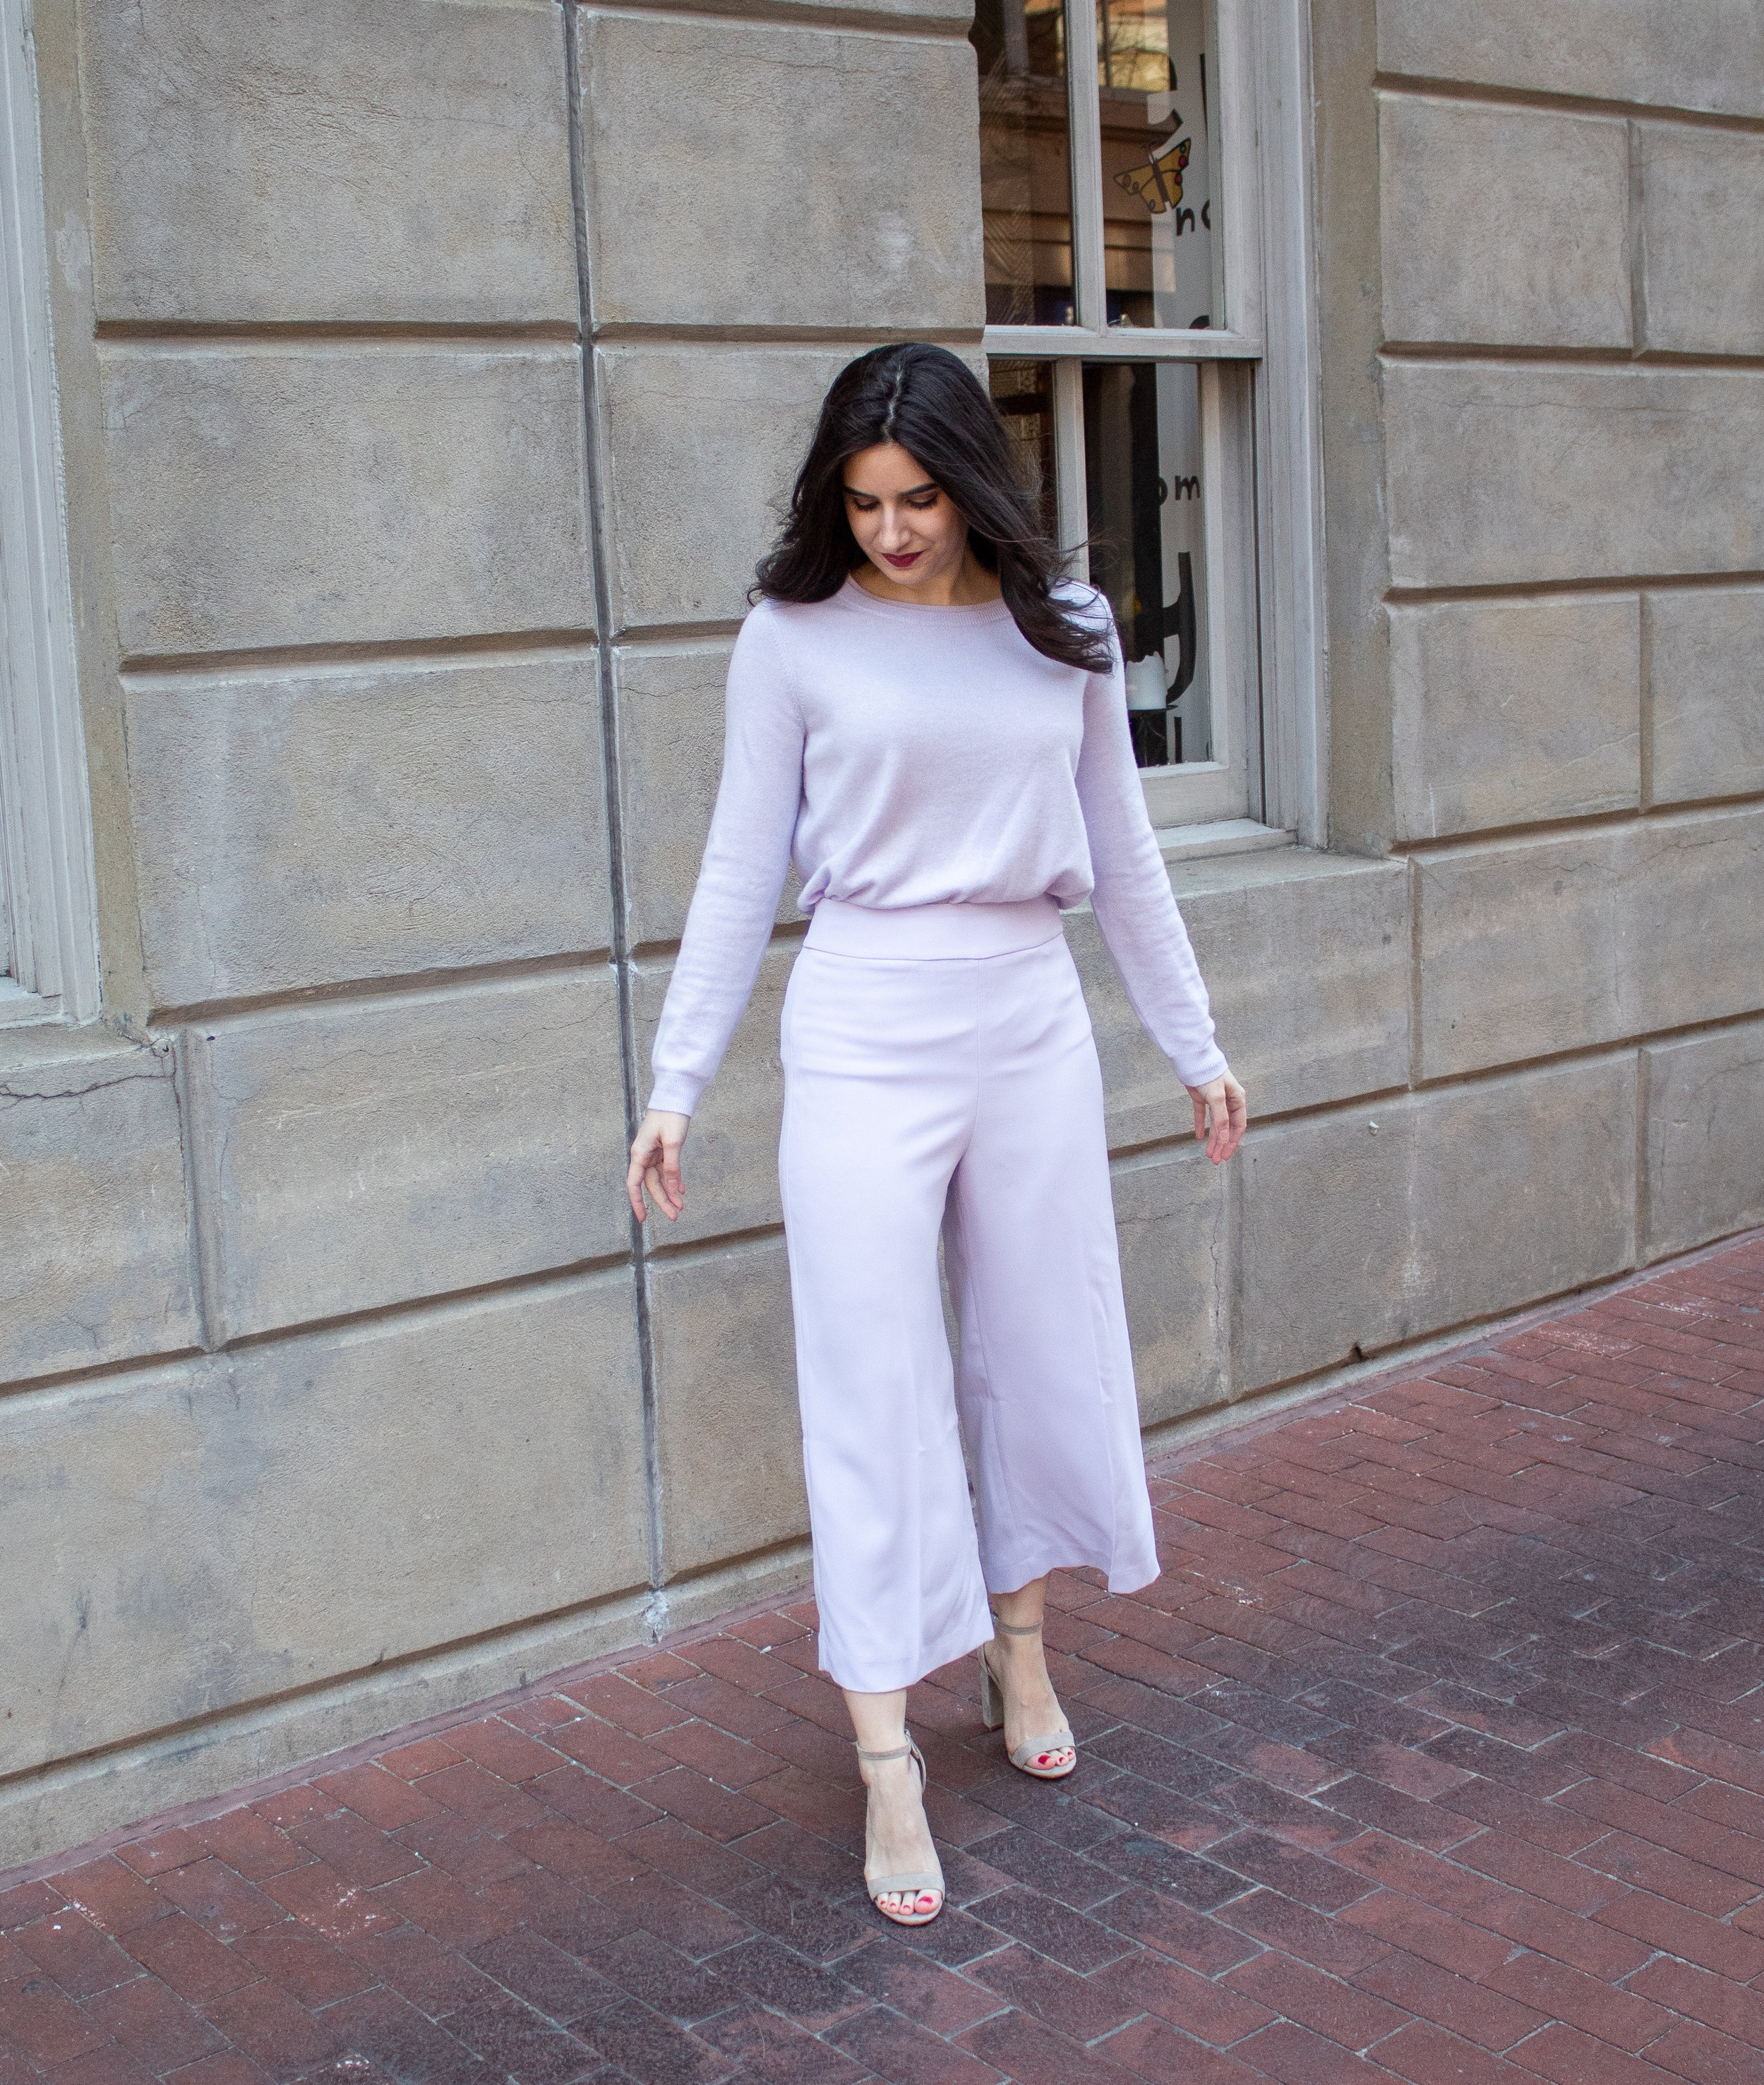 Sweater:  Pure , Bottoms:  Express (lilac purple) , Shoes:  Similar, Nordstrom, Sam Edelman